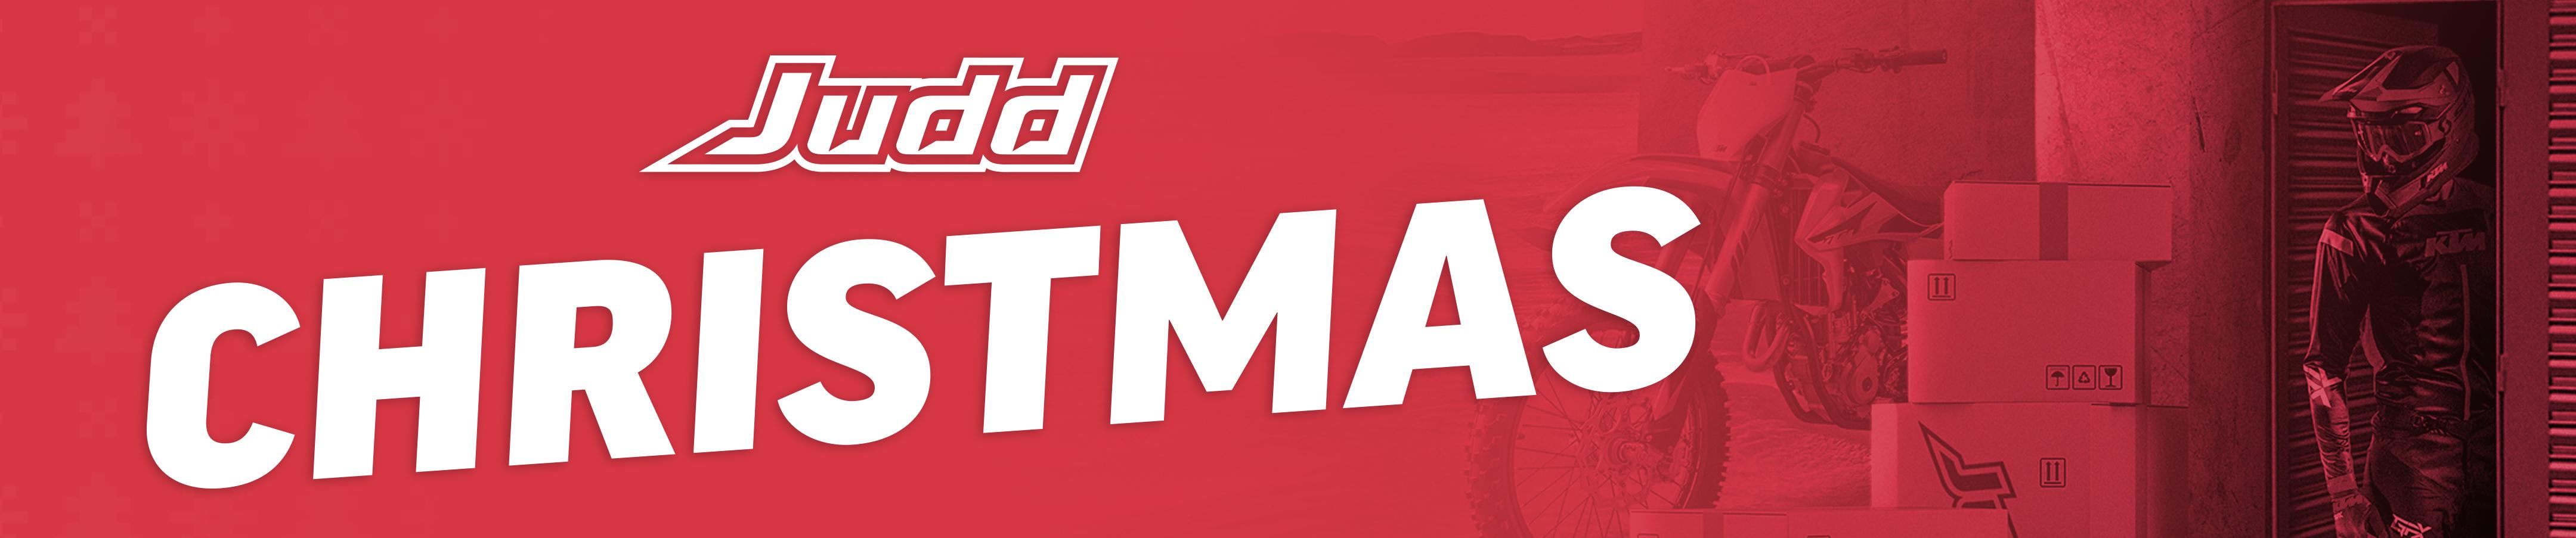 judd-christmas-banner-2020-webpage.jpg